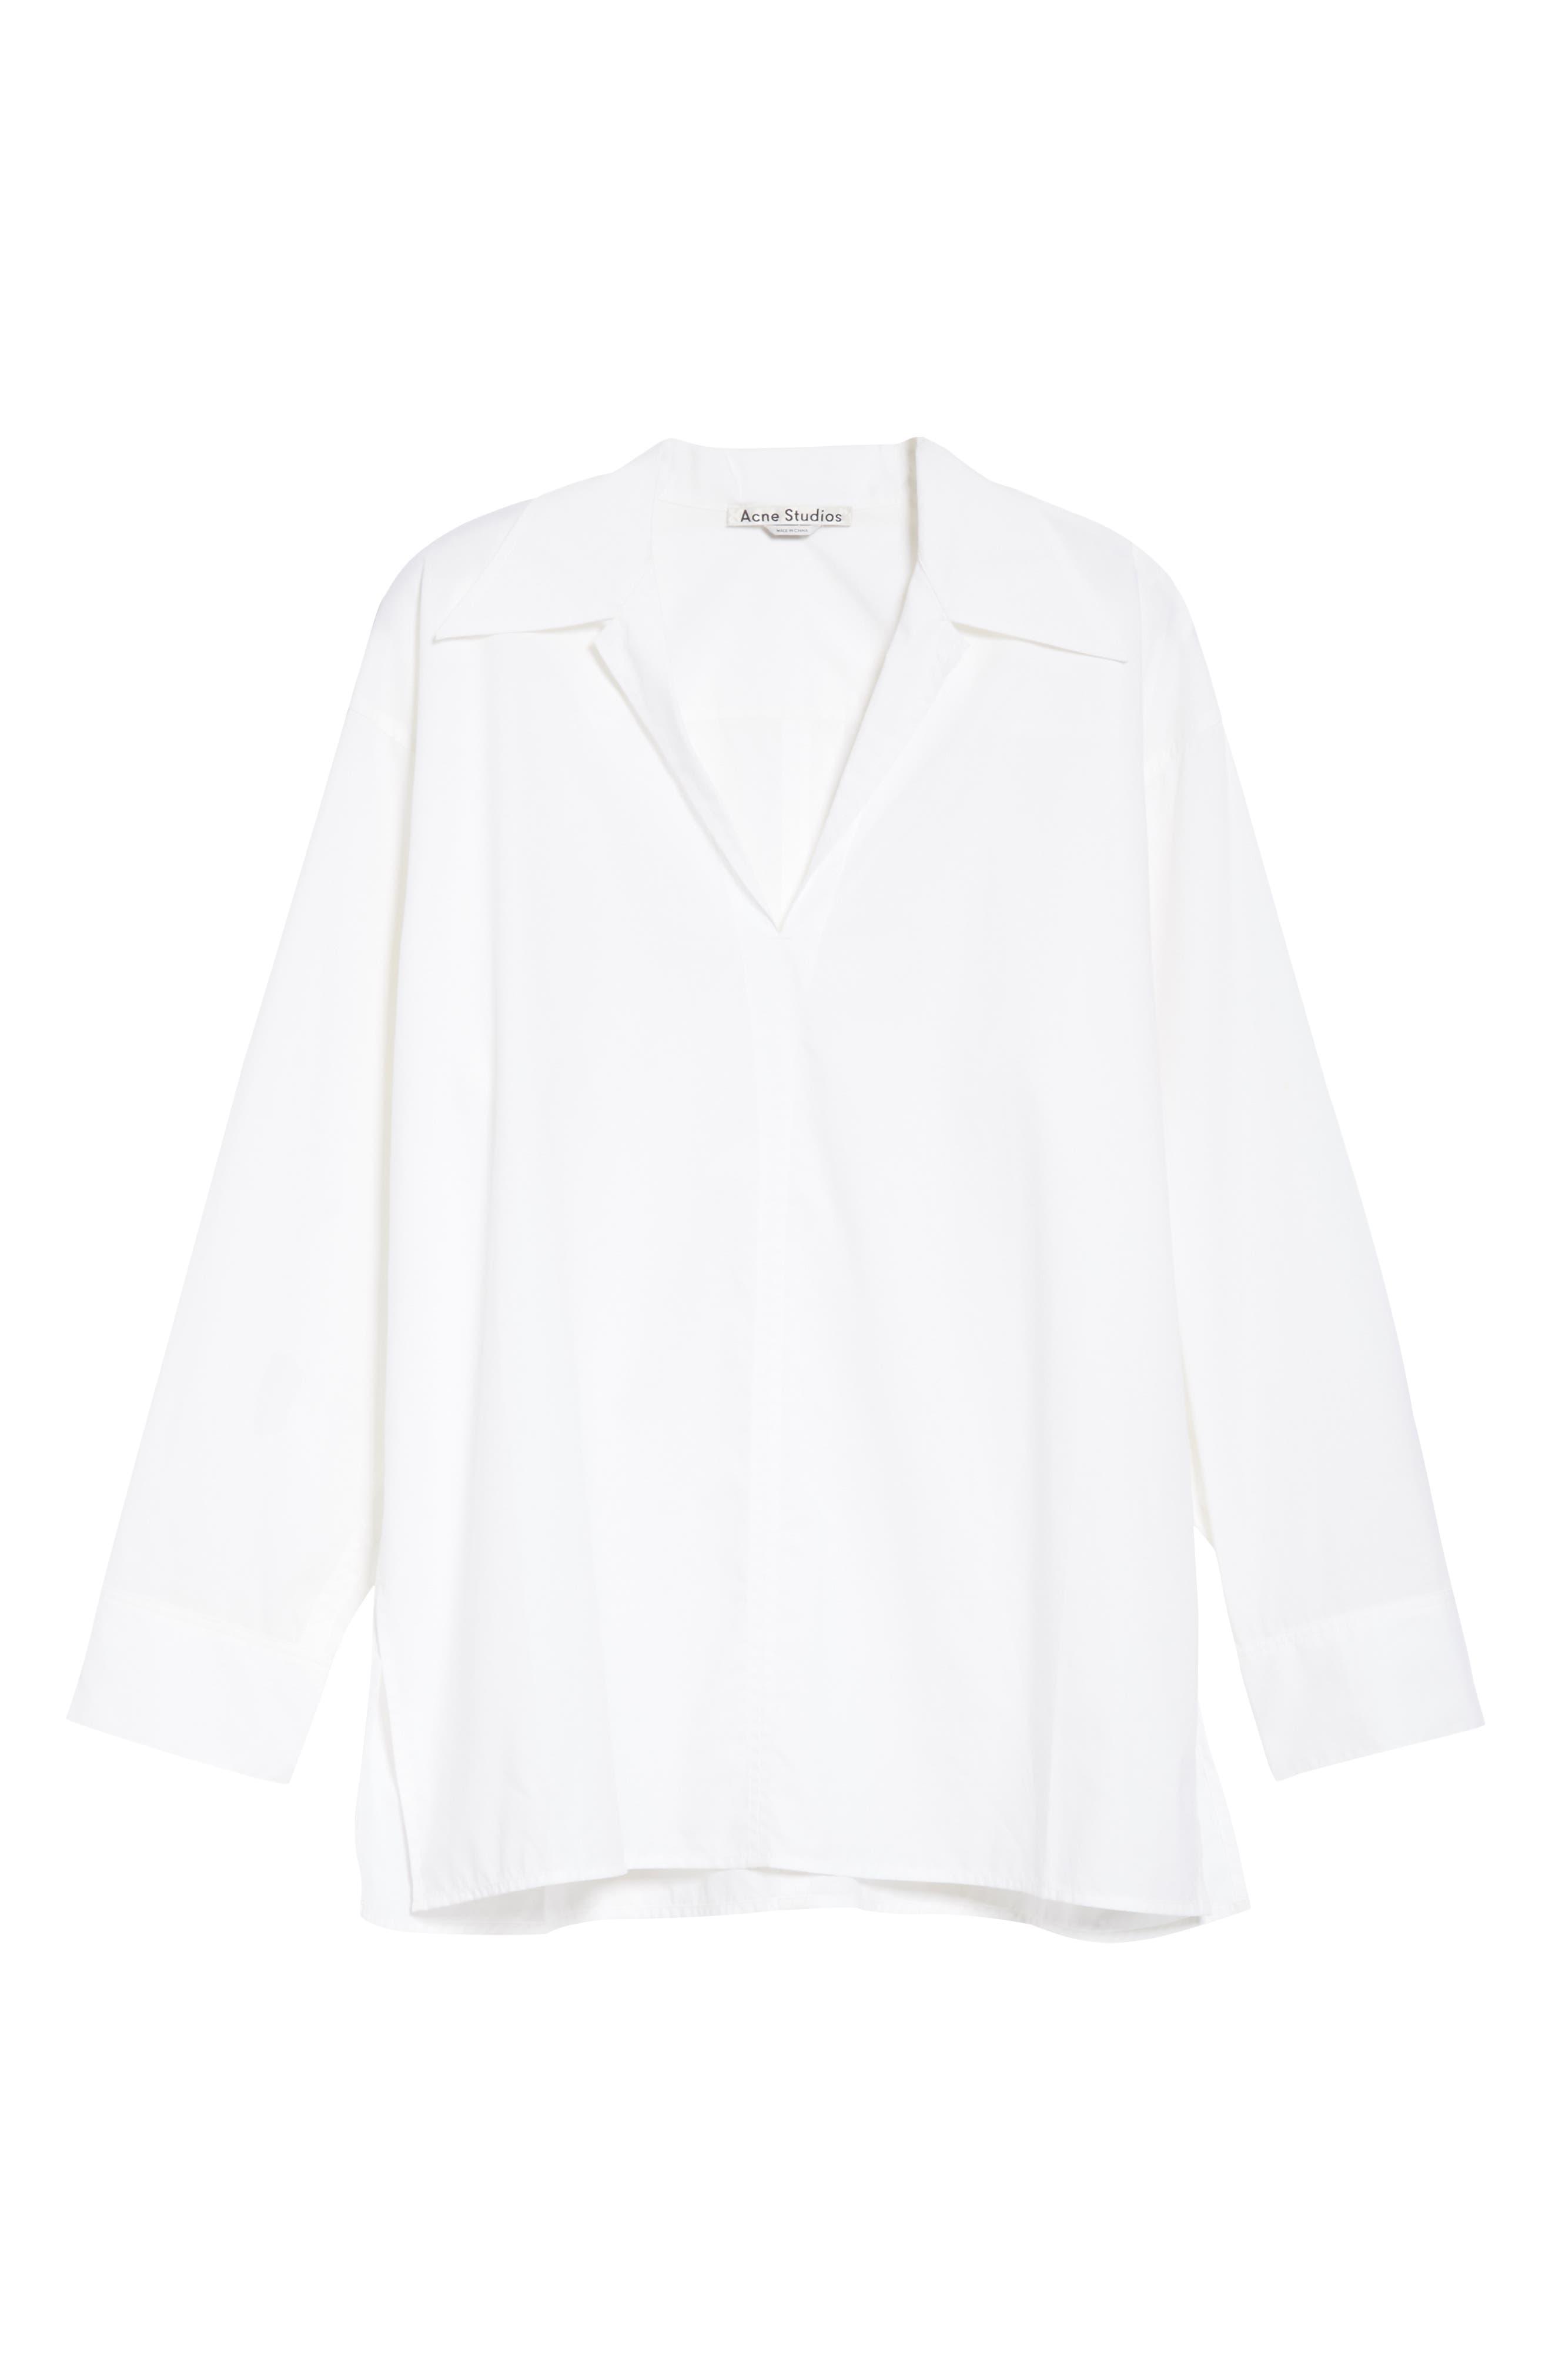 ACNE STUDIOS,                             Spread Collar Shirt,                             Alternate thumbnail 6, color,                             WHITE